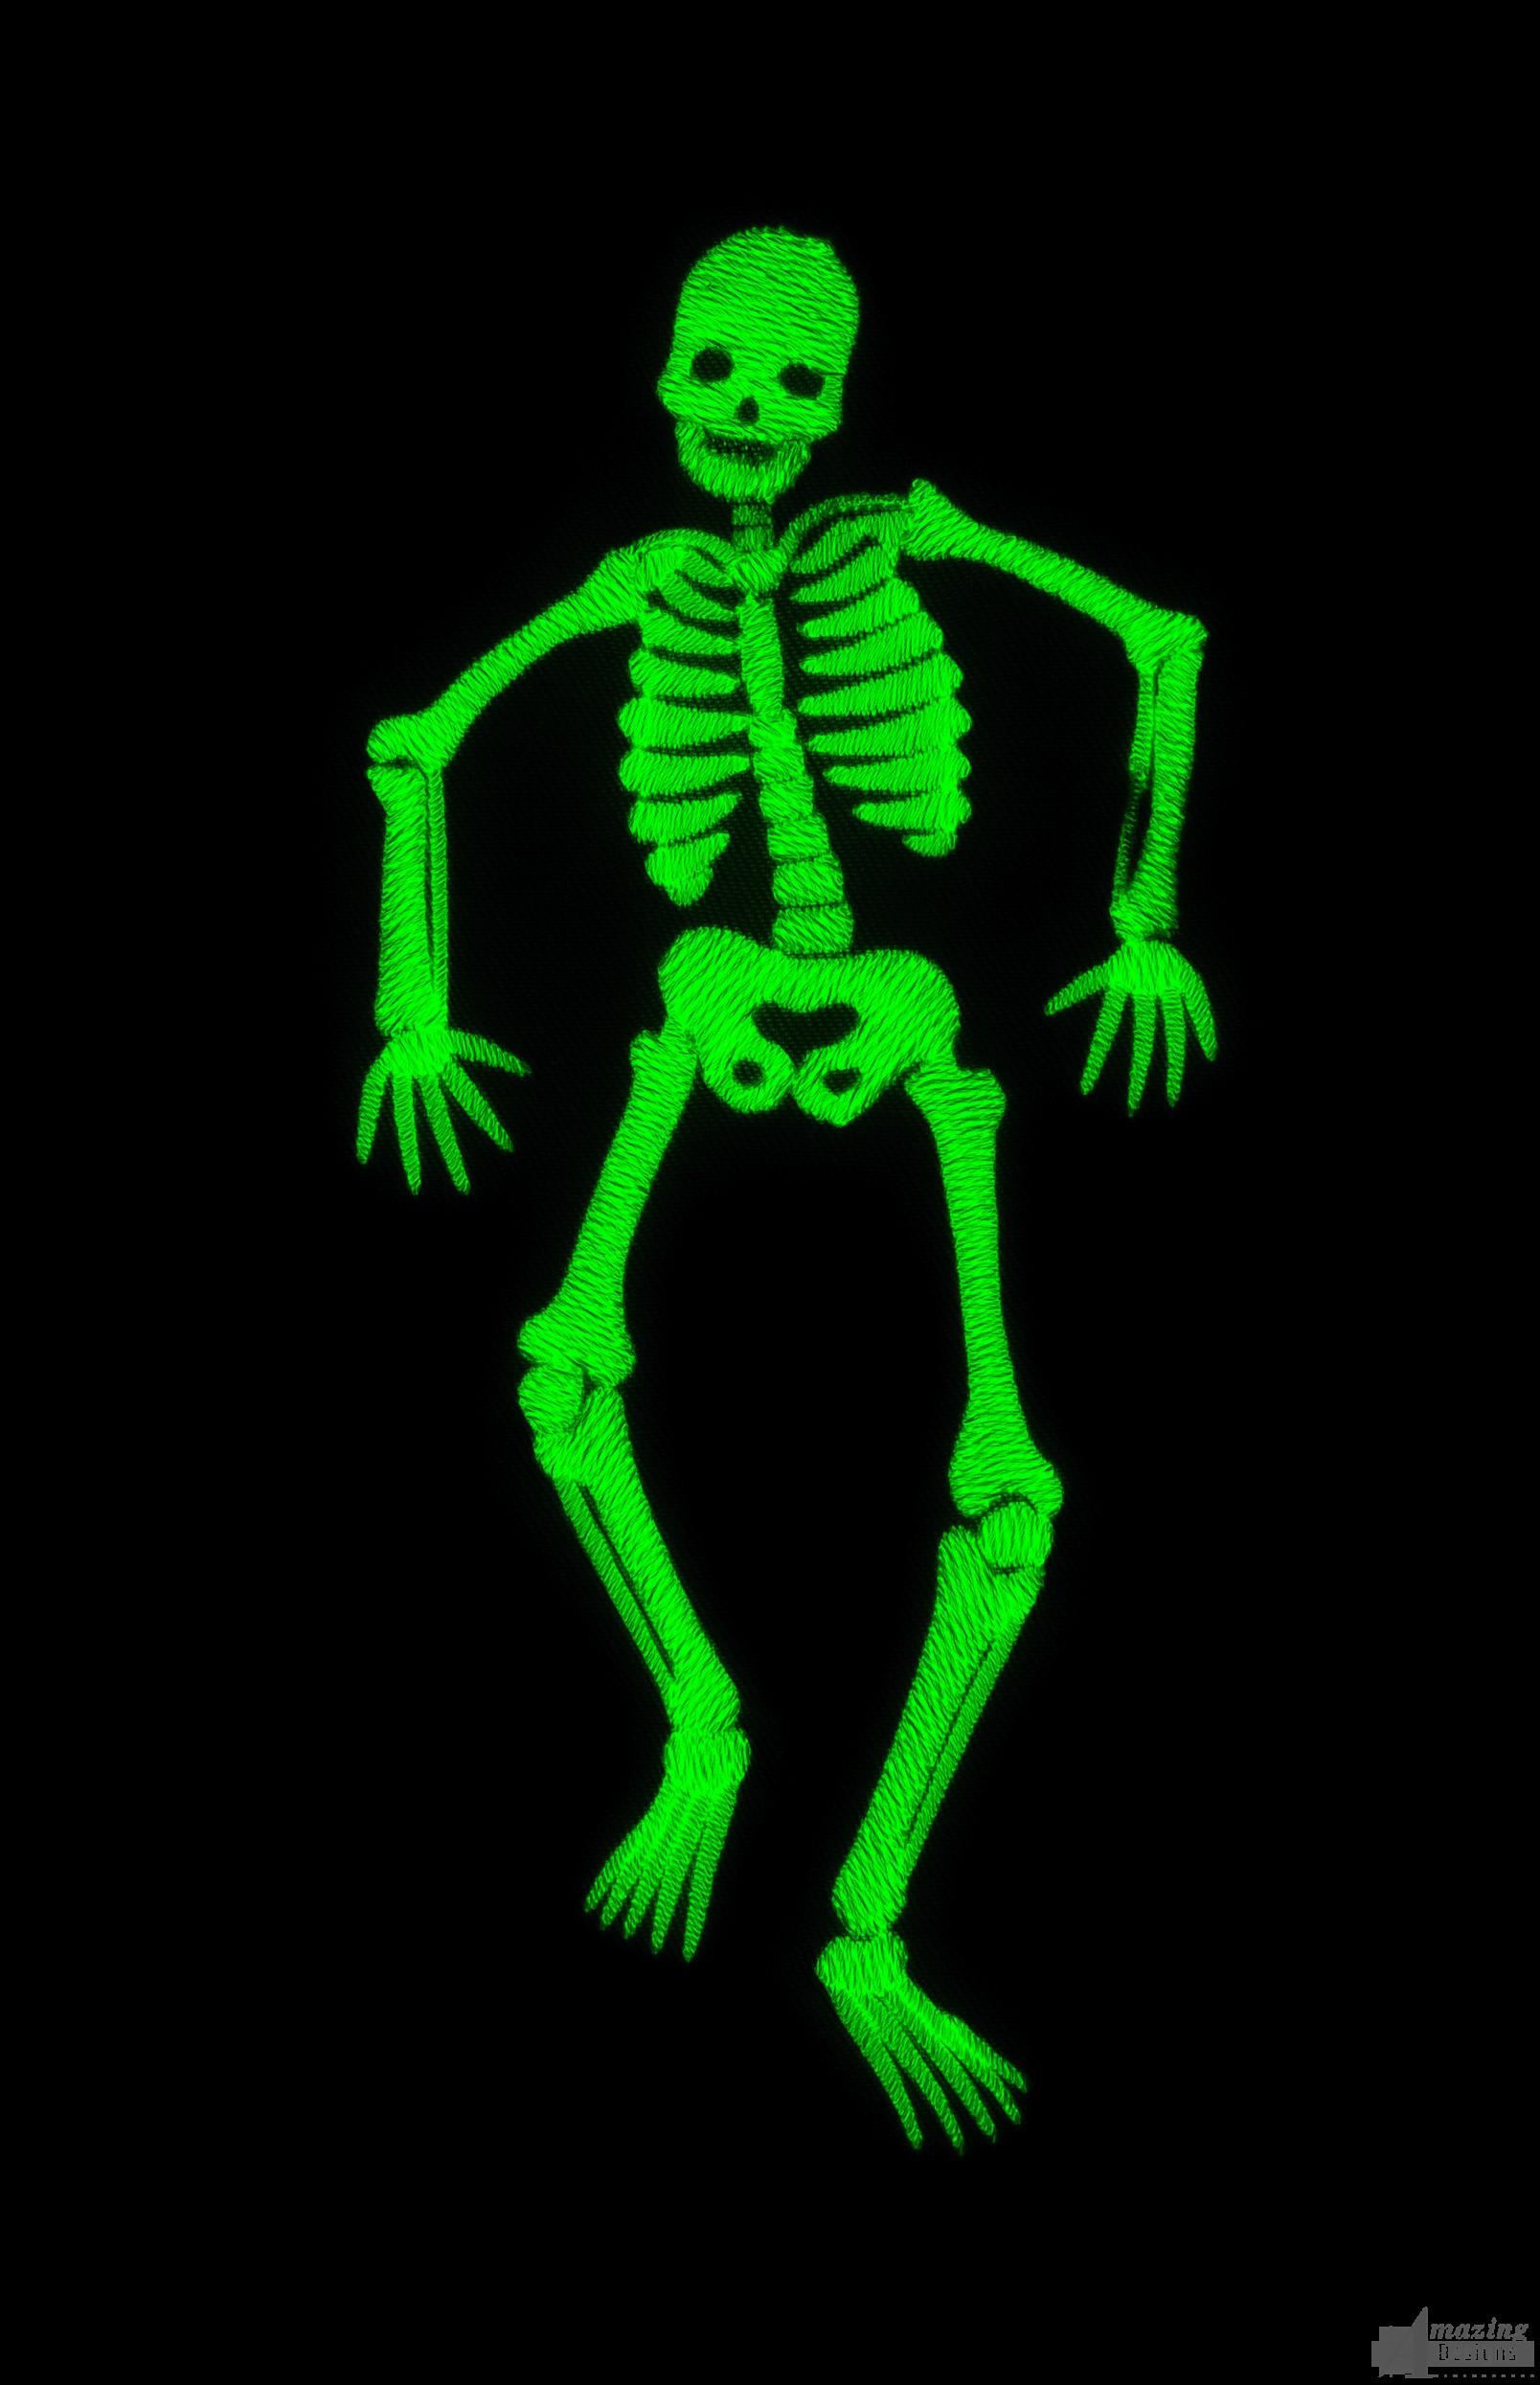 Glow In The Dark Skeleton Embroidery Design